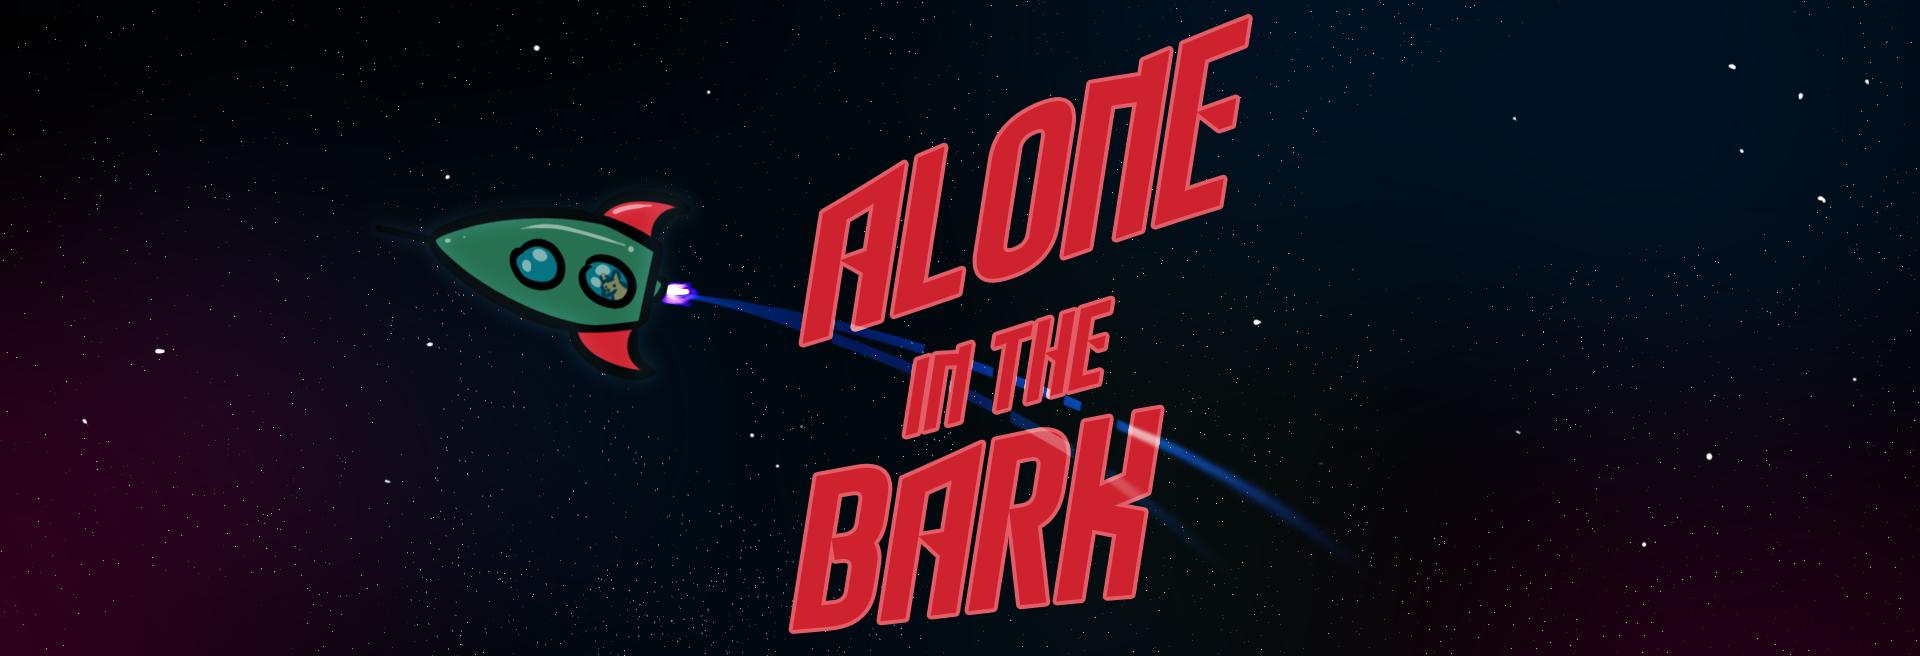 Alone in the Bark